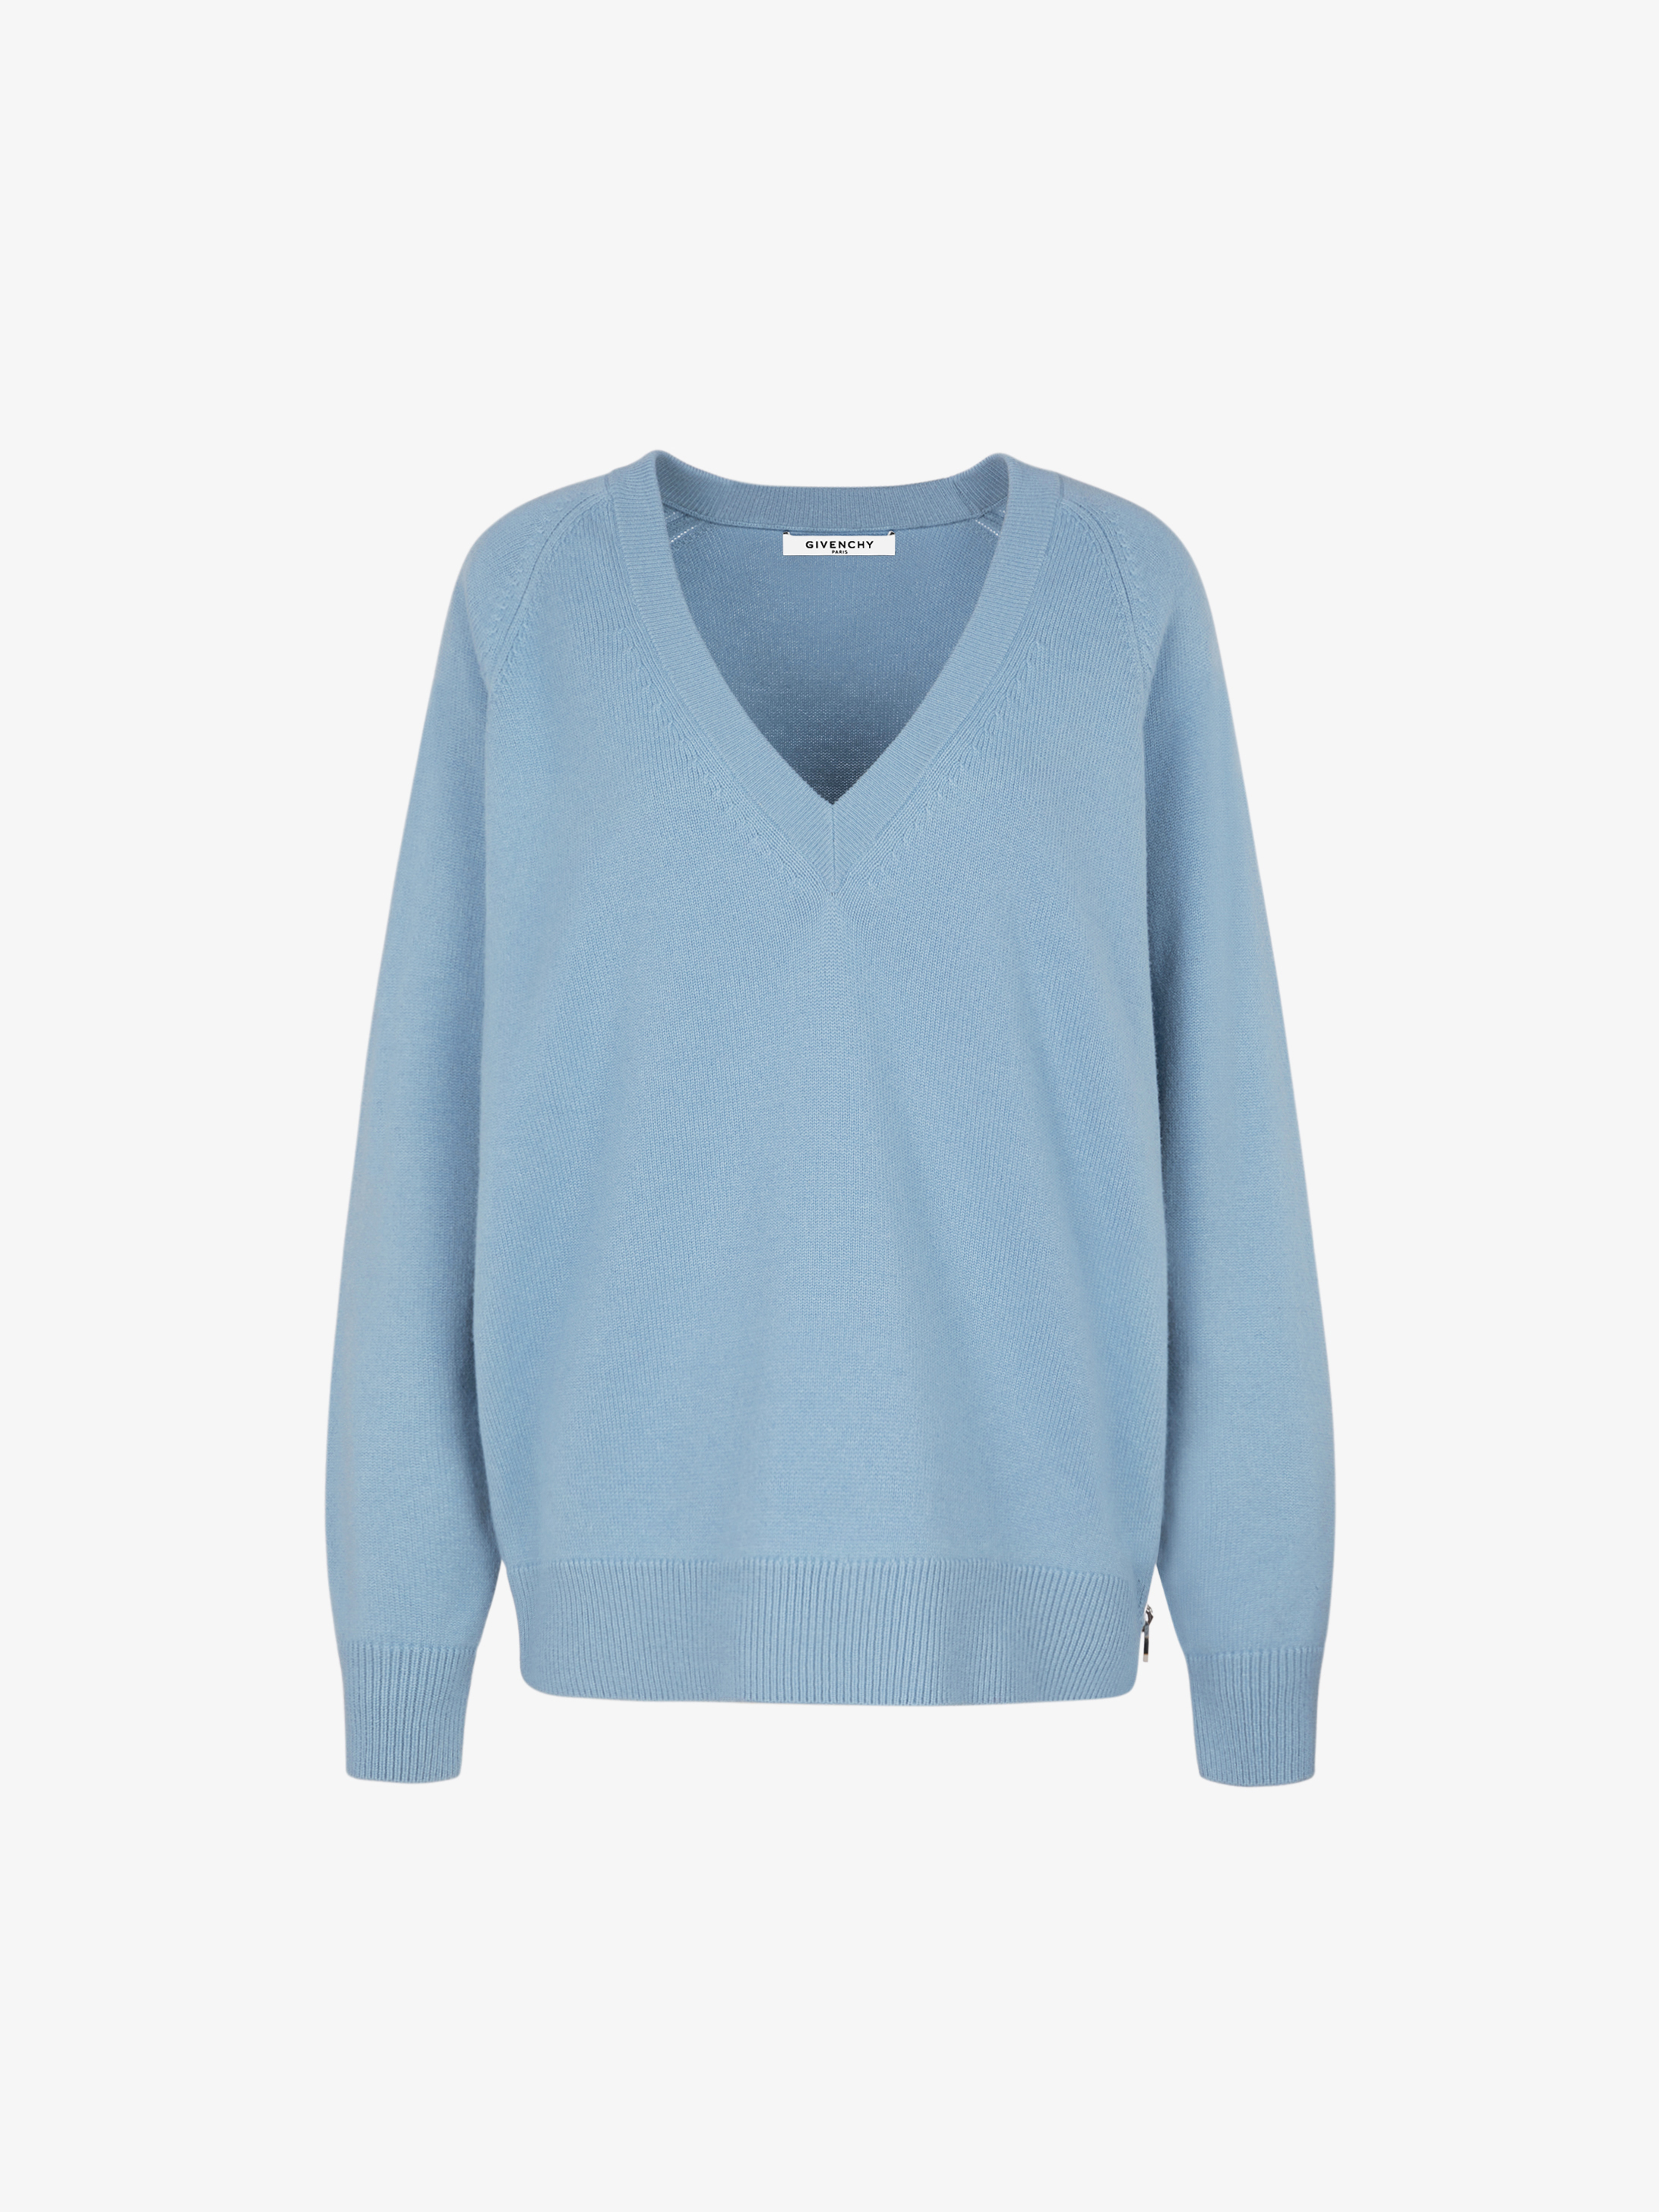 V neckline sweater with zip